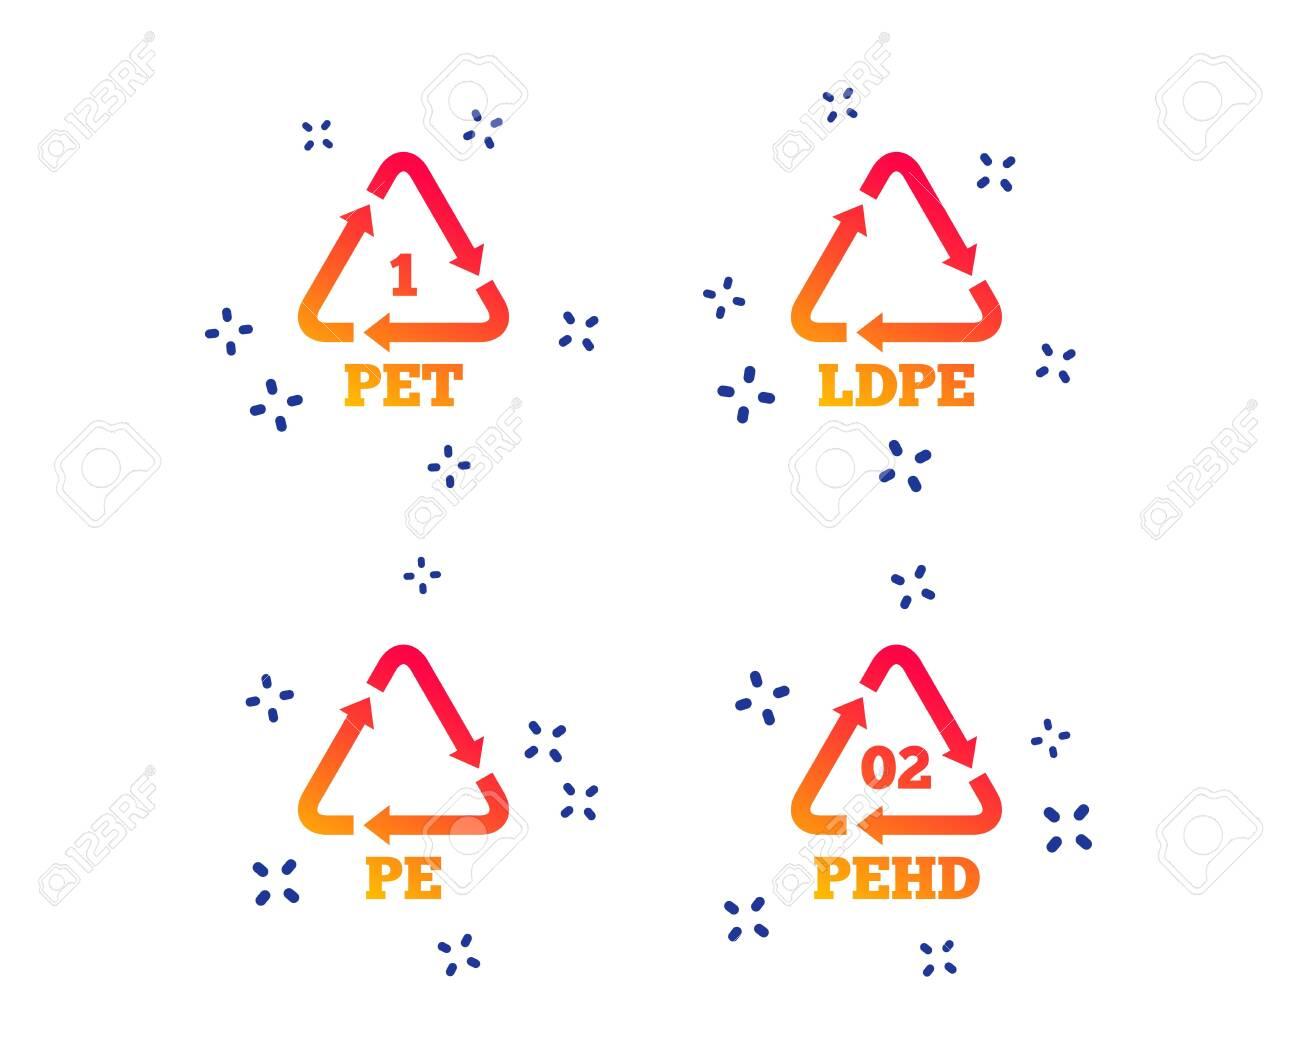 PET, Ld-pe and Hd-pe icons. High-density Polyethylene terephthalate sign. Recycling symbol. Random dynamic shapes. Gradient plastic pet icon. Vector - 126174184